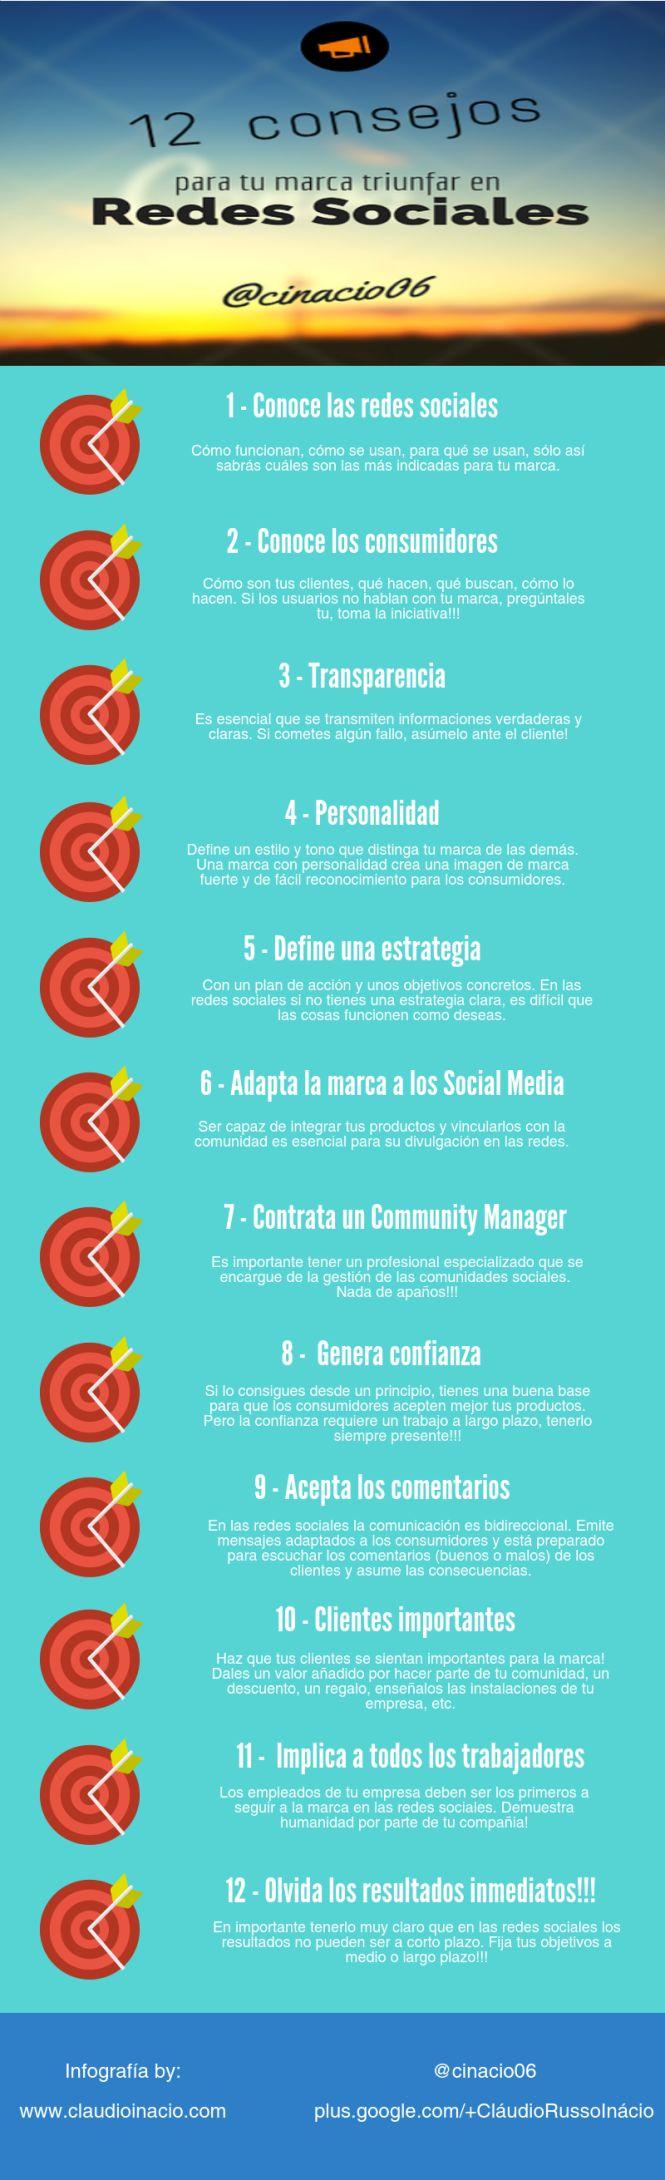 12 consejos para que tu marca triunfe en Redes Sociales #infografia #marketing #socialmedia